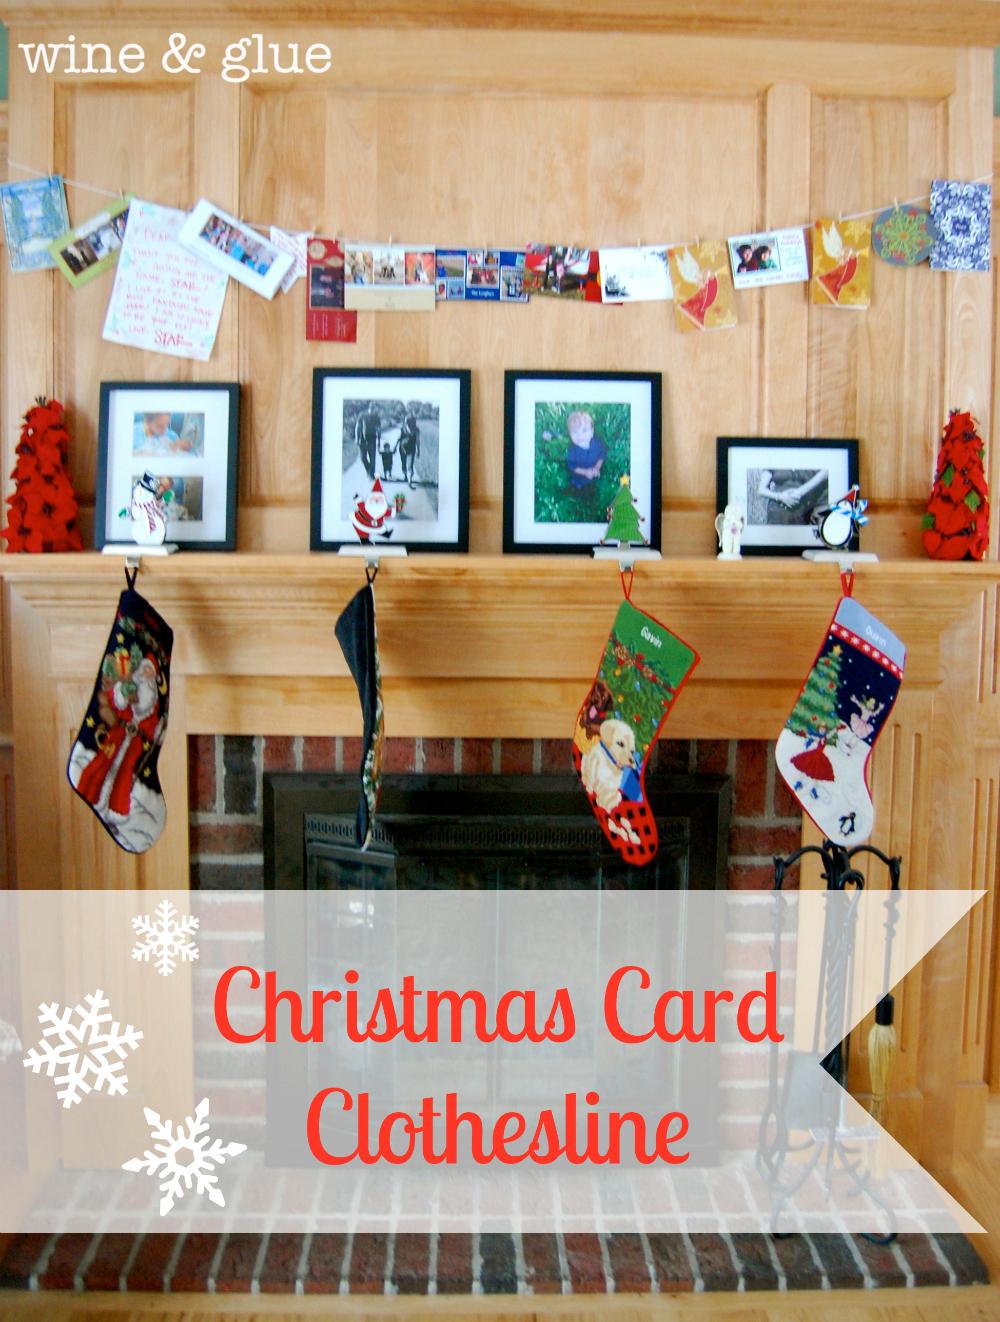 Christmas Card Clothesline - Wine & Glue